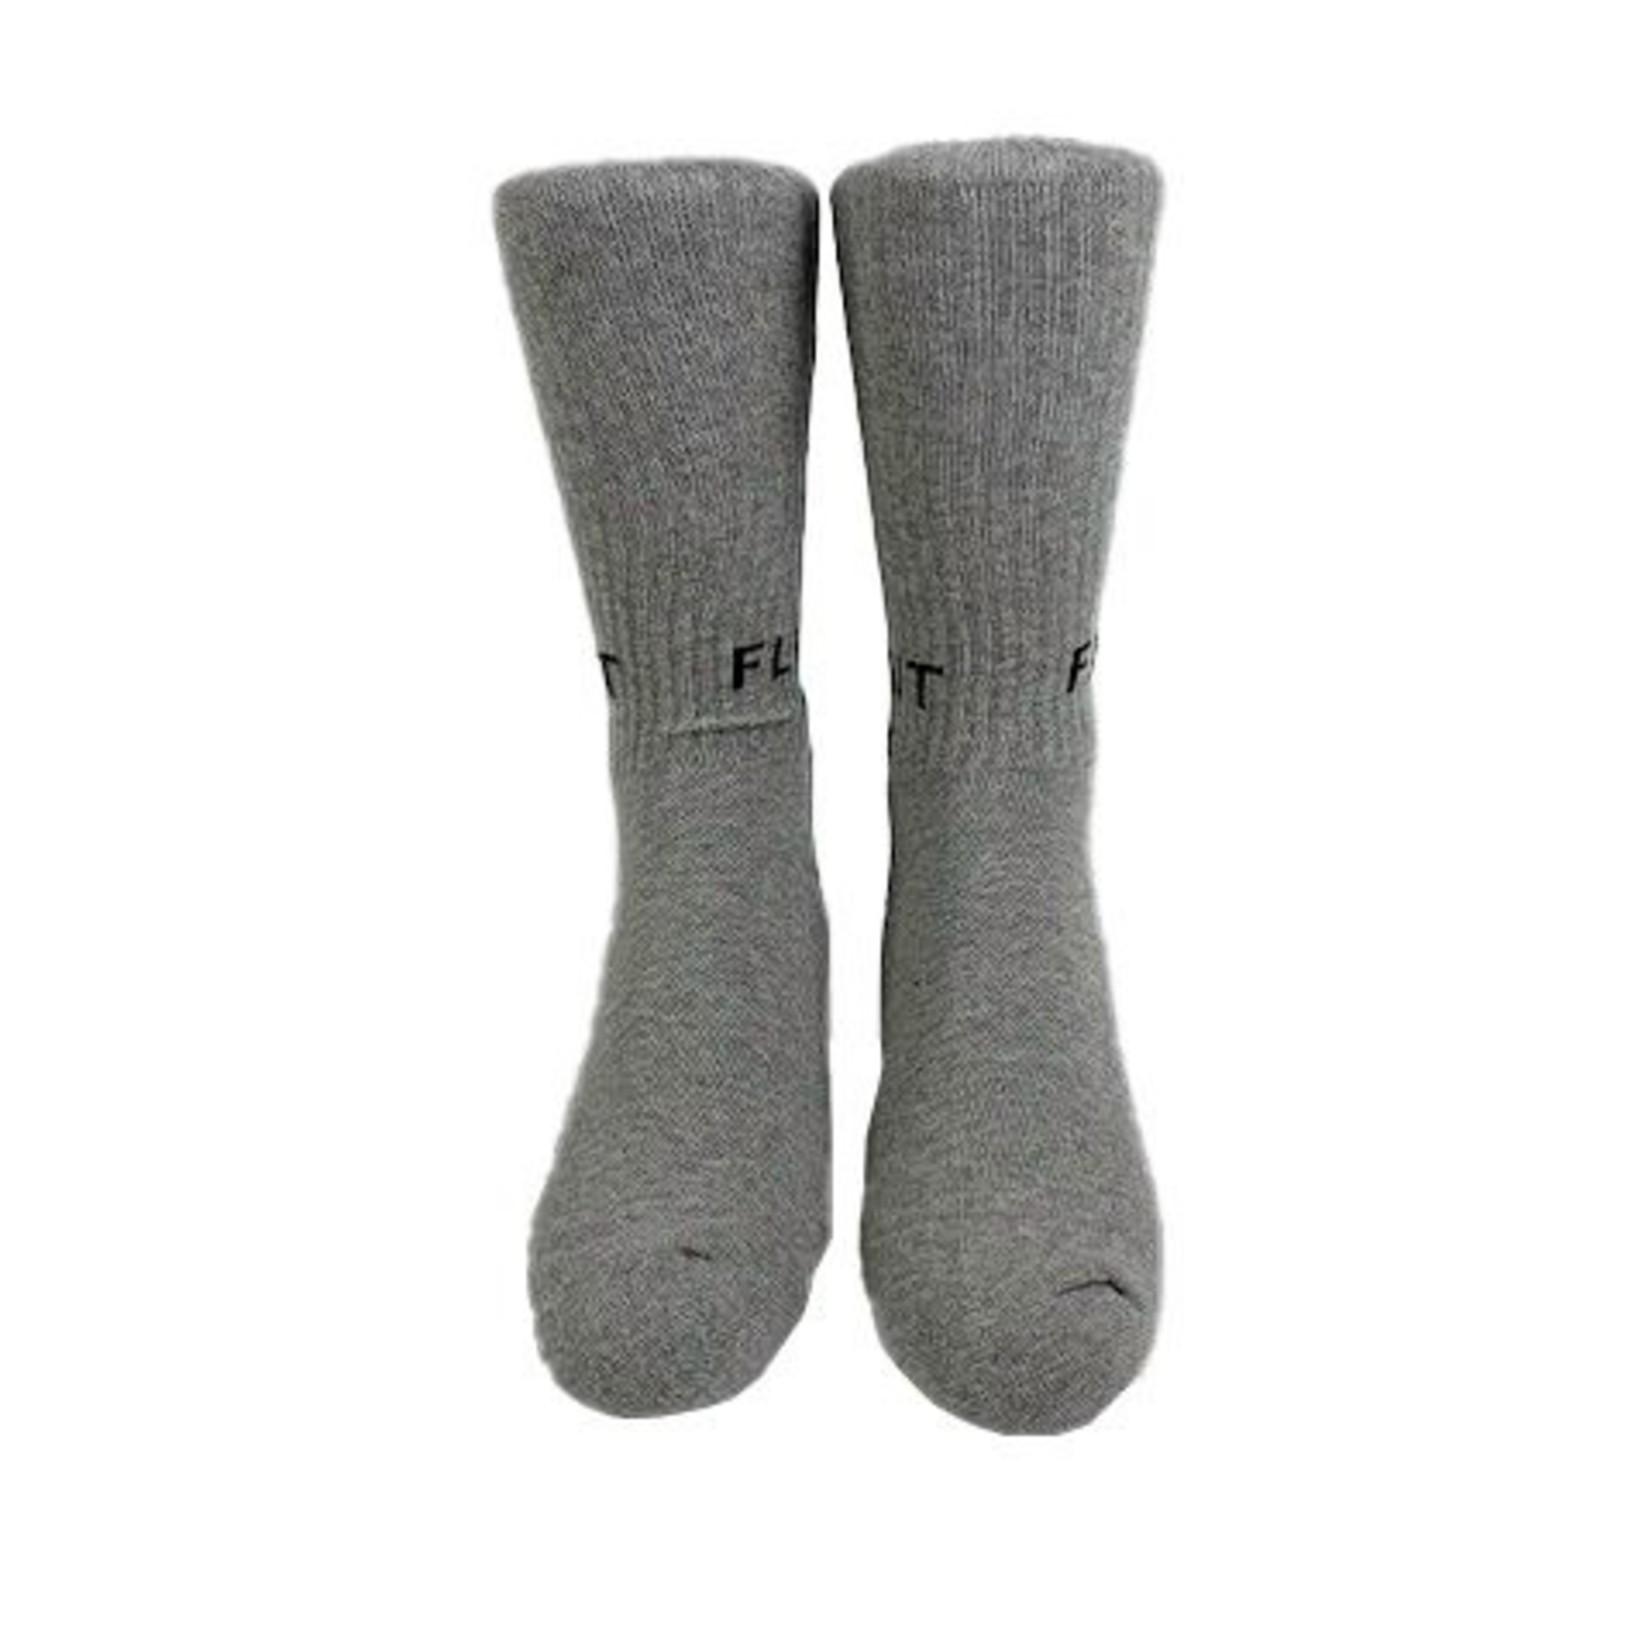 Flying Point Buddha Crew Socks